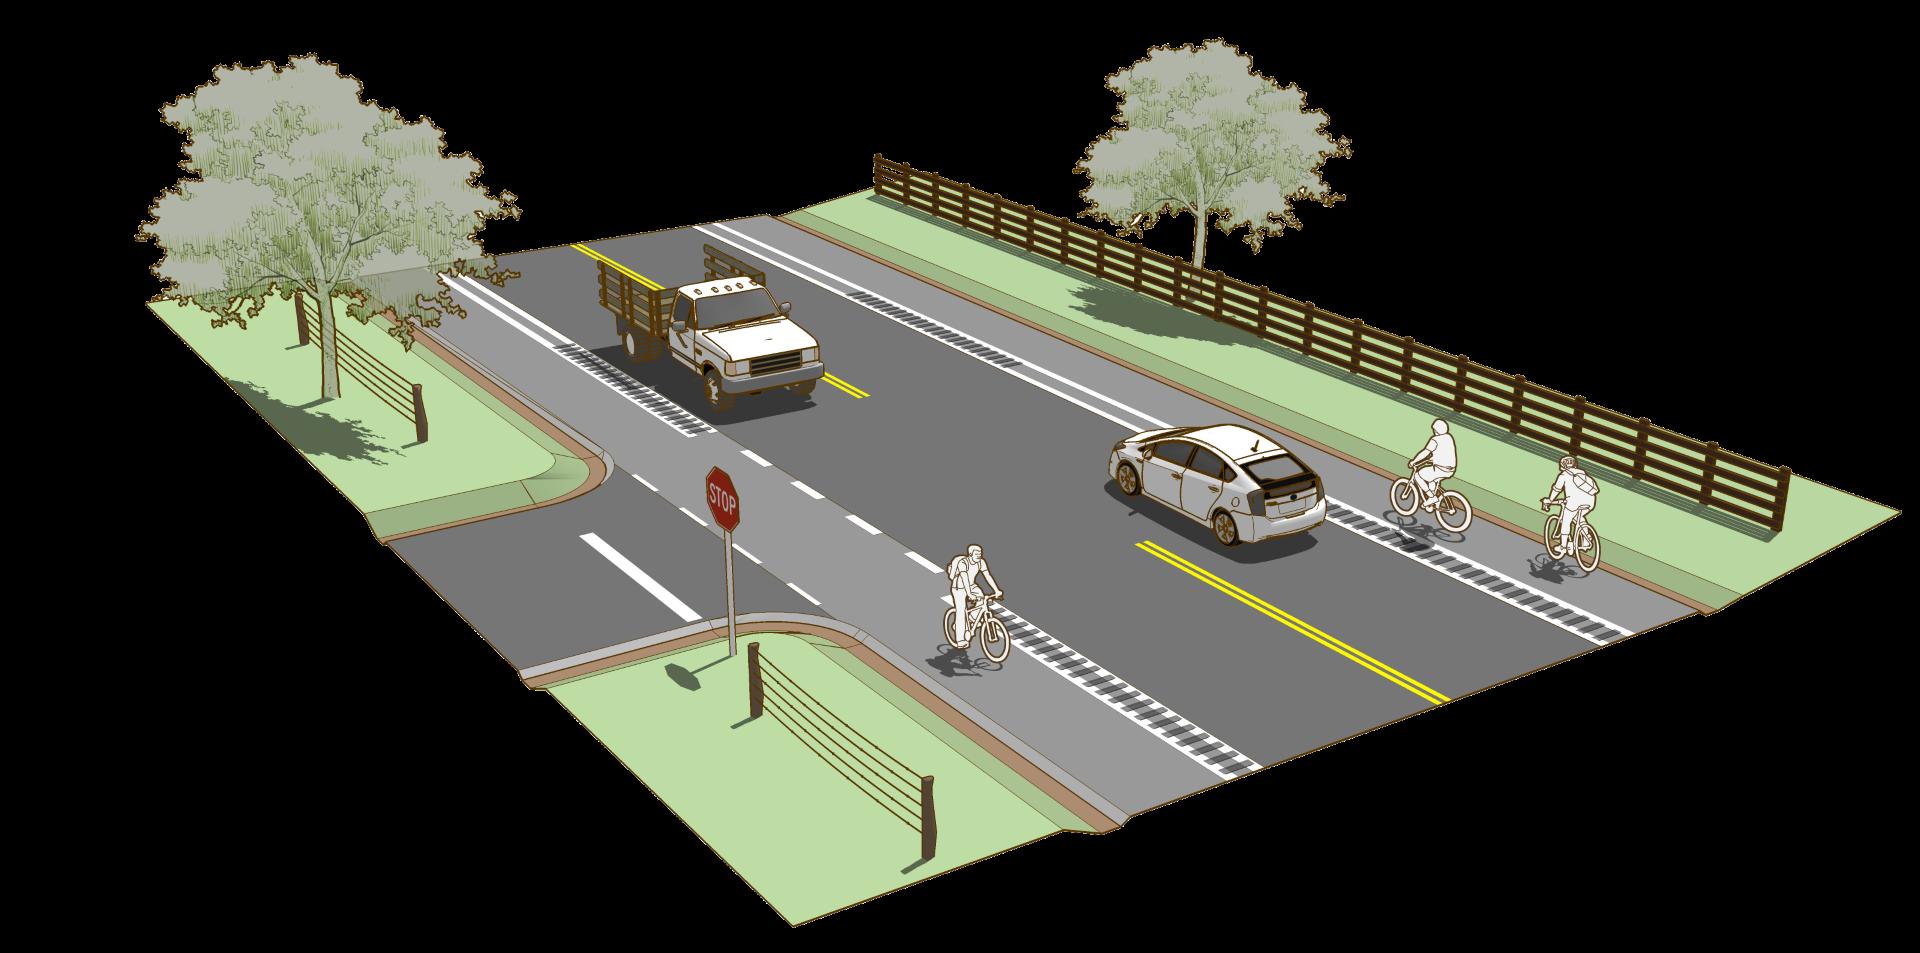 Shoulder rural design guide. Pathway clipart paved road